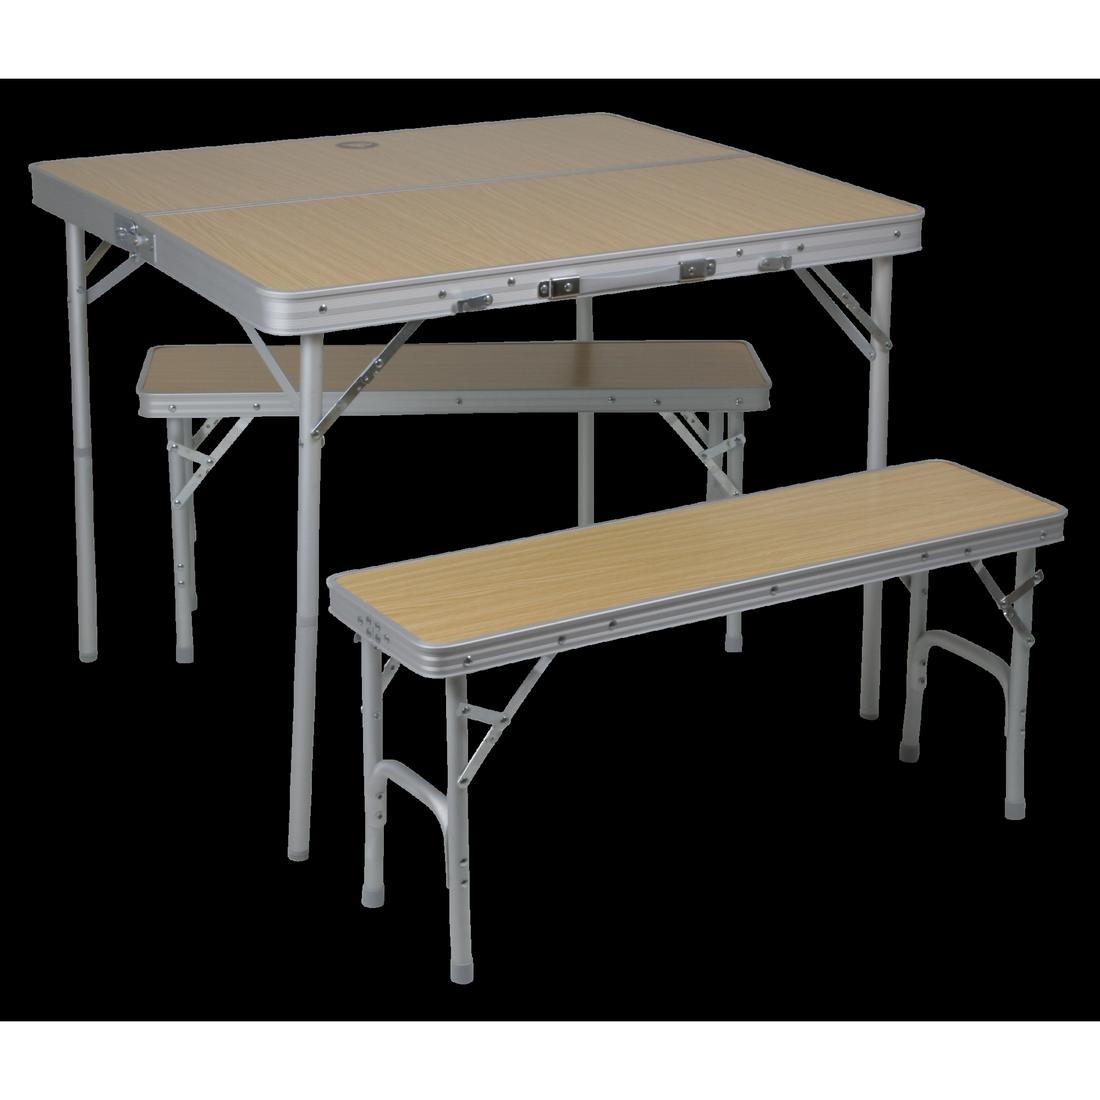 10t portable bench ensemble table et banc mobile 4 - Ensemble table et banc ...